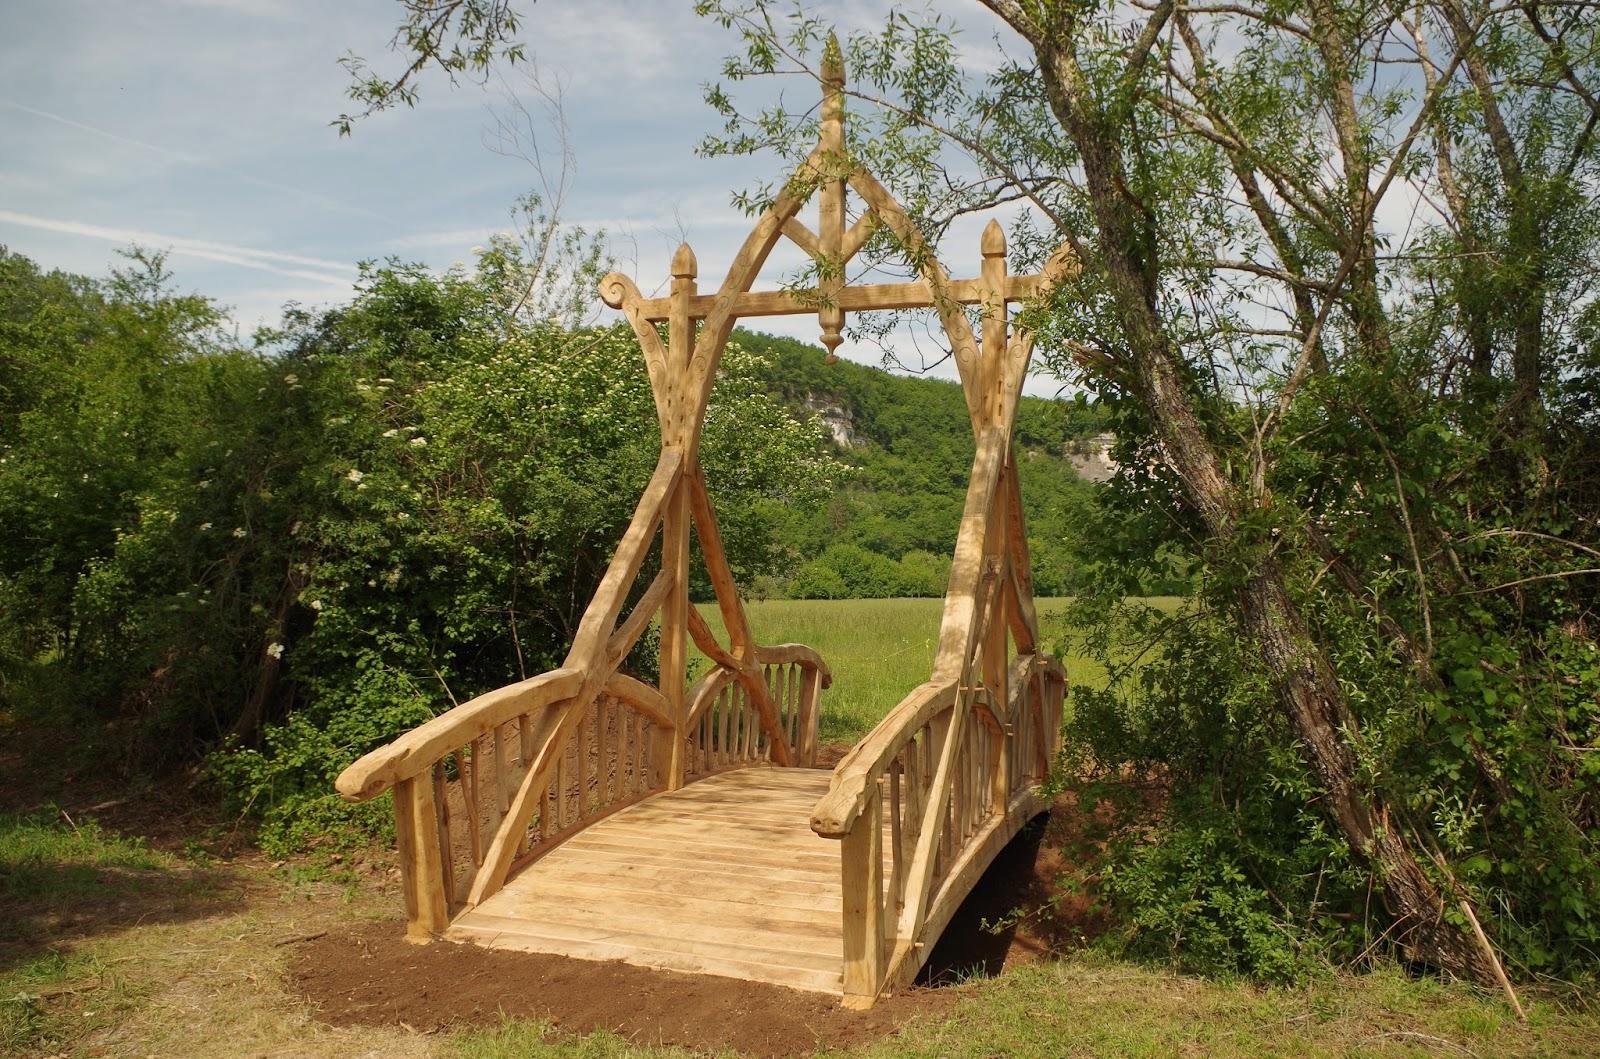 Petit pont de bois dans la vall e de la v z re - Petit pont en bois ...